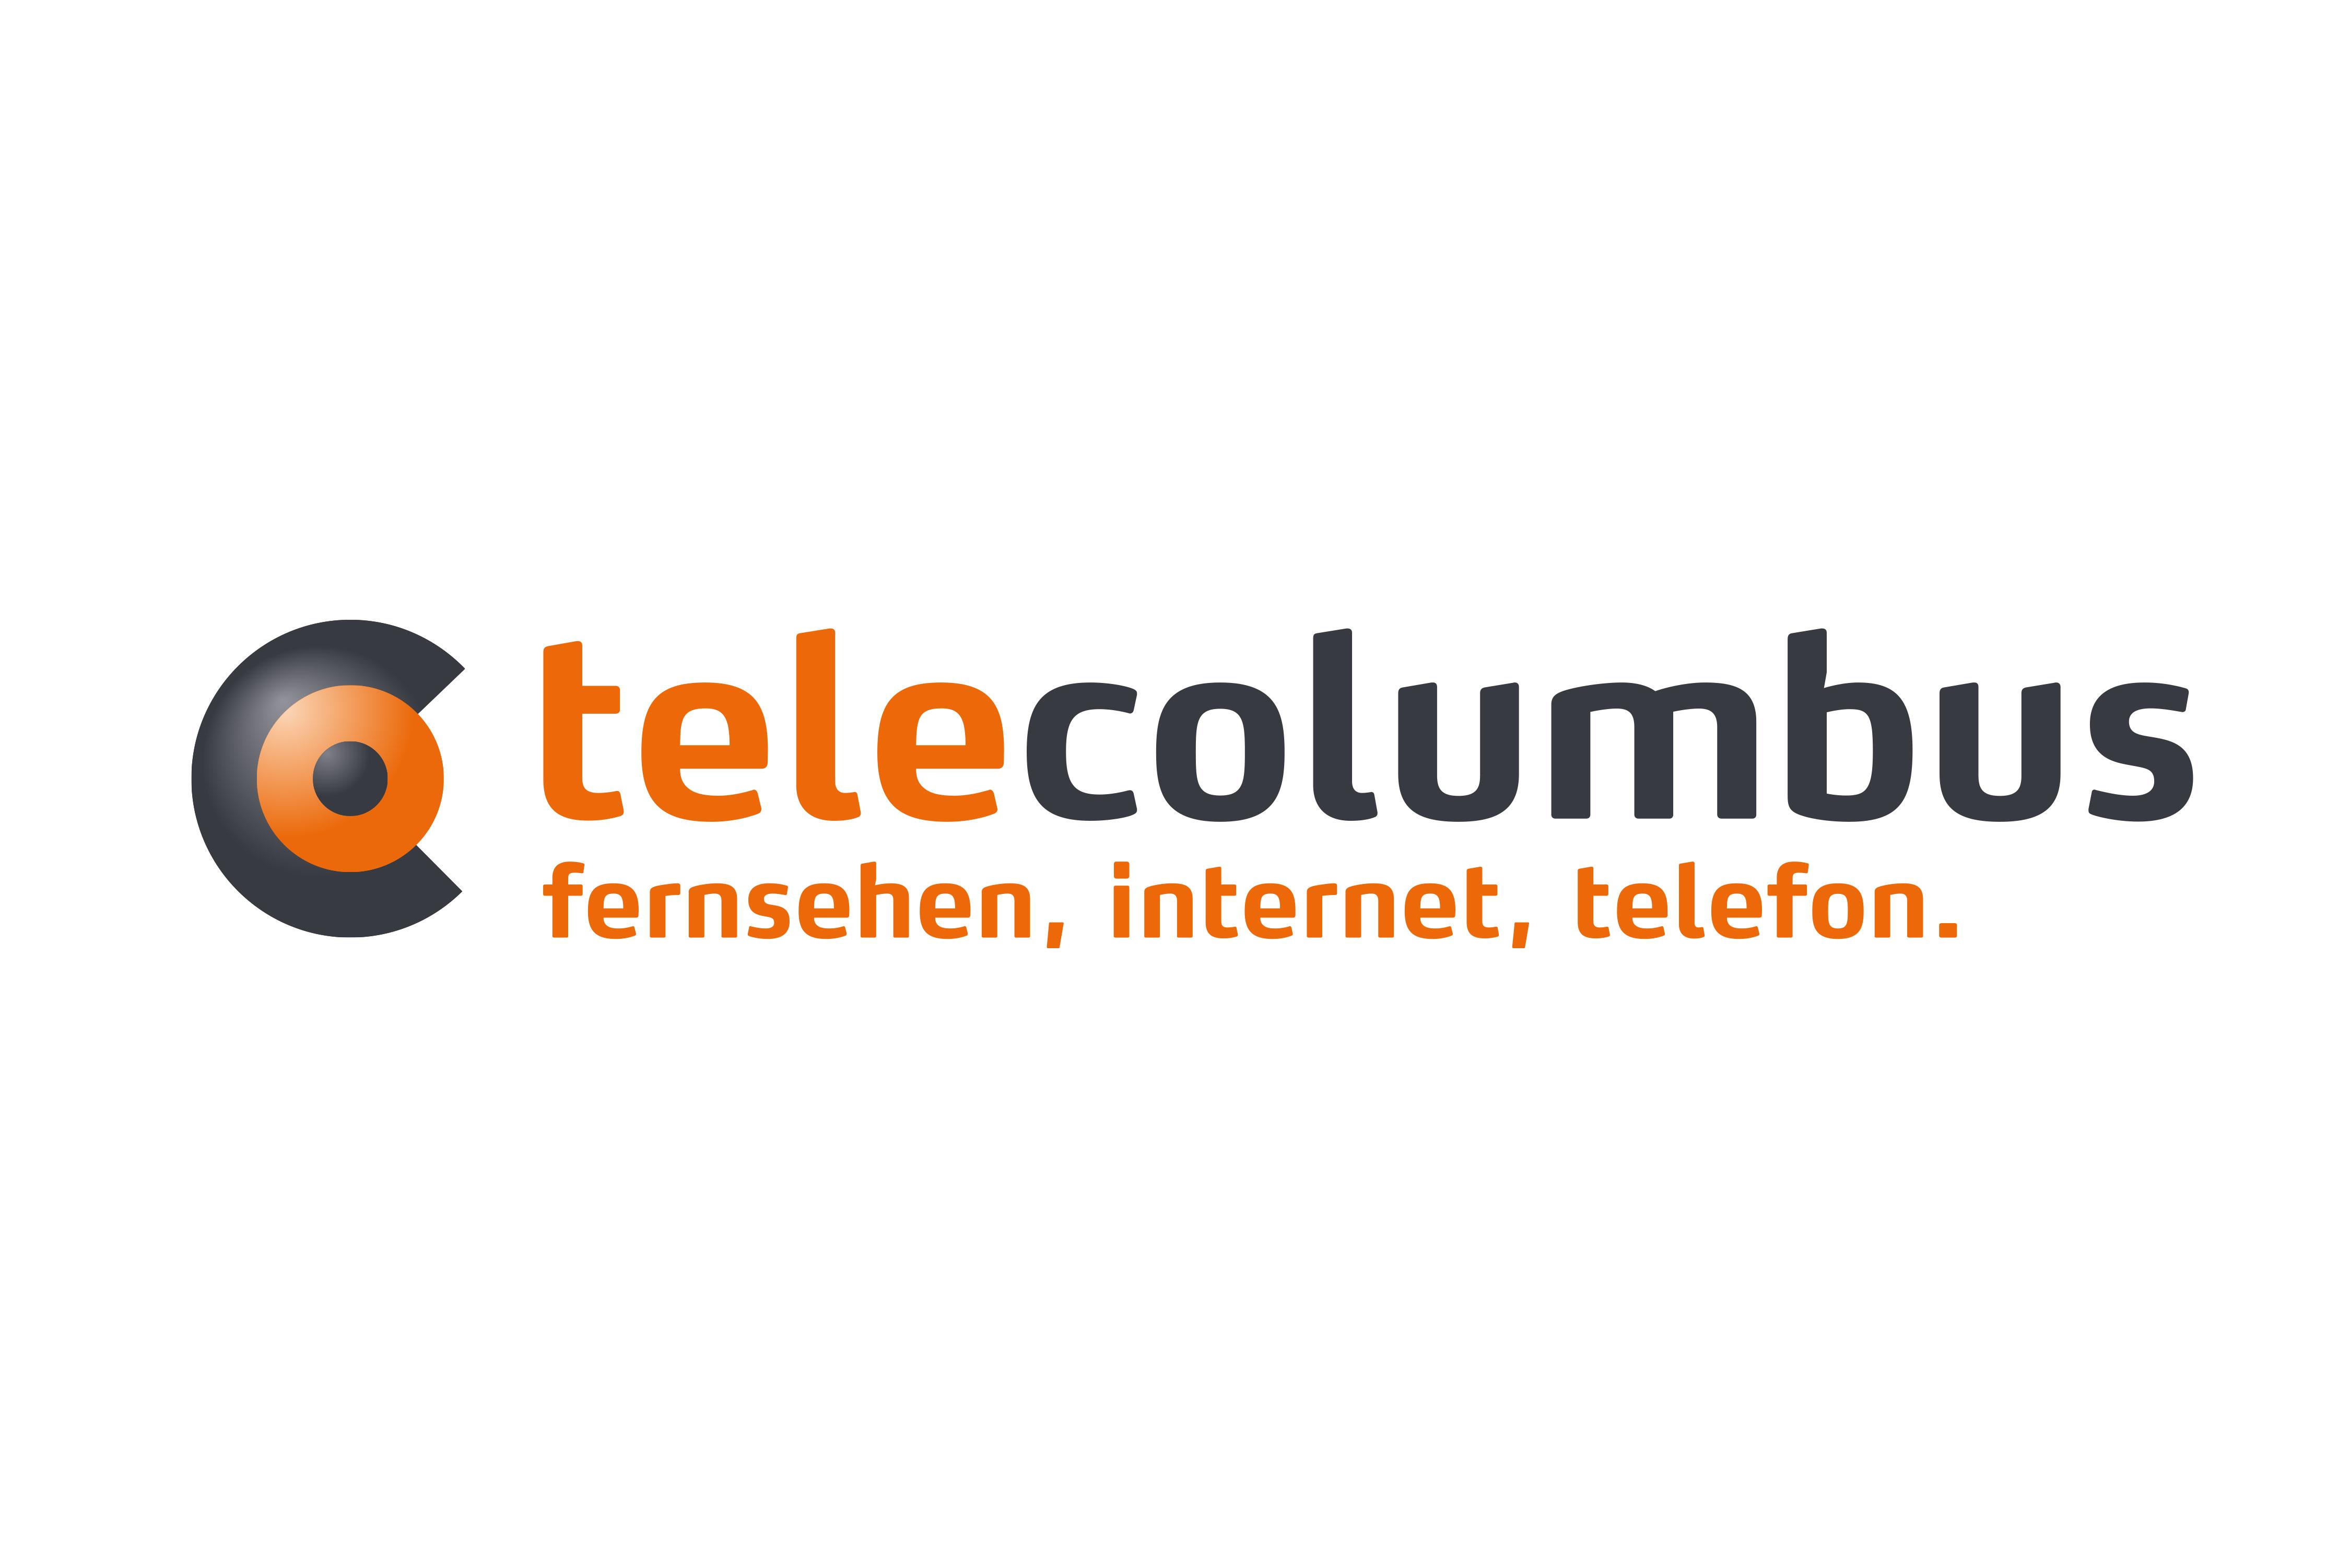 telecolumbus-logo